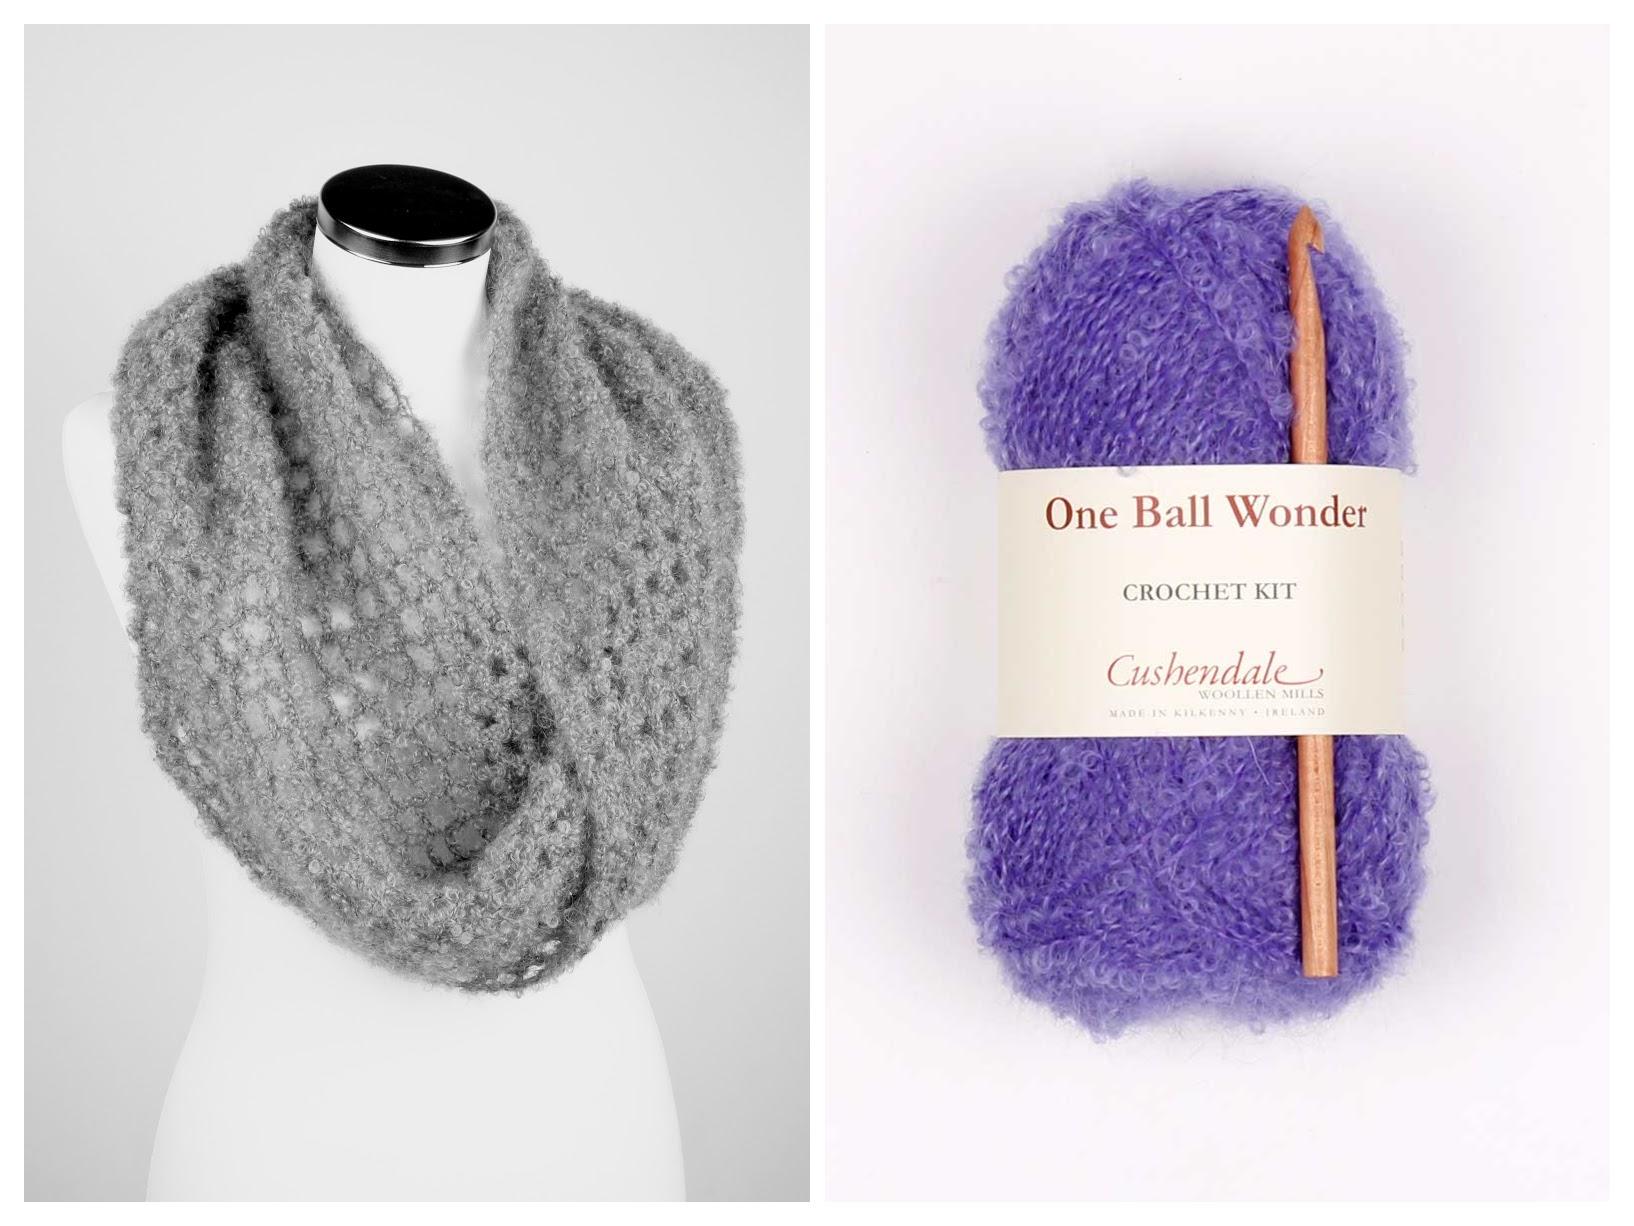 Snood Mohair Crochet Kit Violet Cushendale Woollen Mills